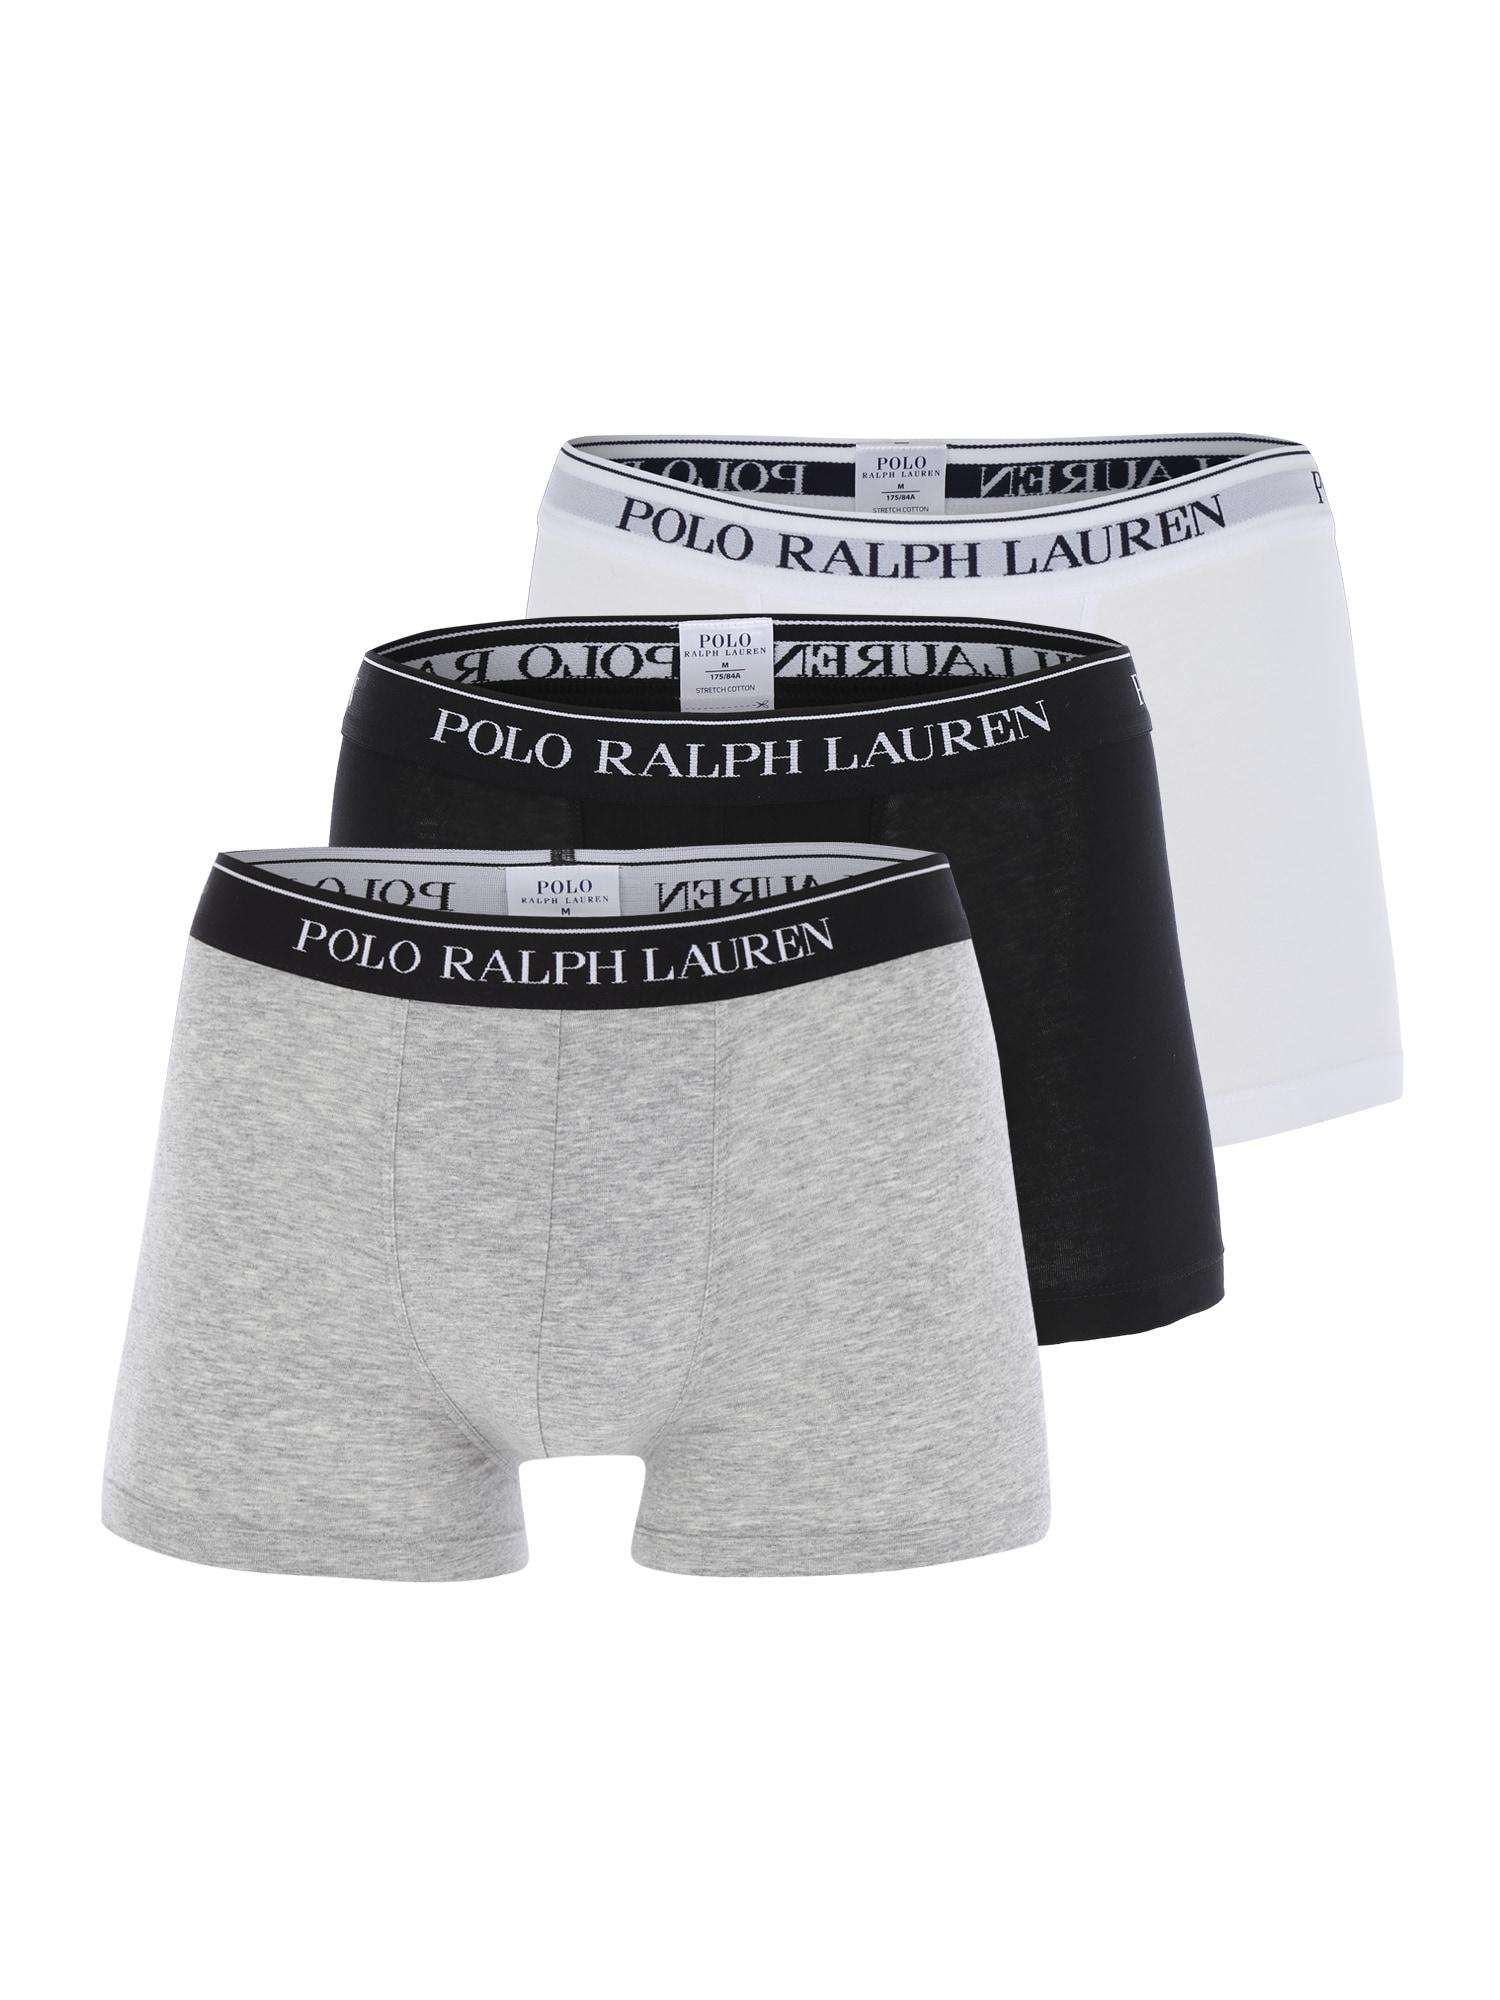 POLO RALPH LAUREN Boxerky 'CLASSIC'  sivá / čierna / biela